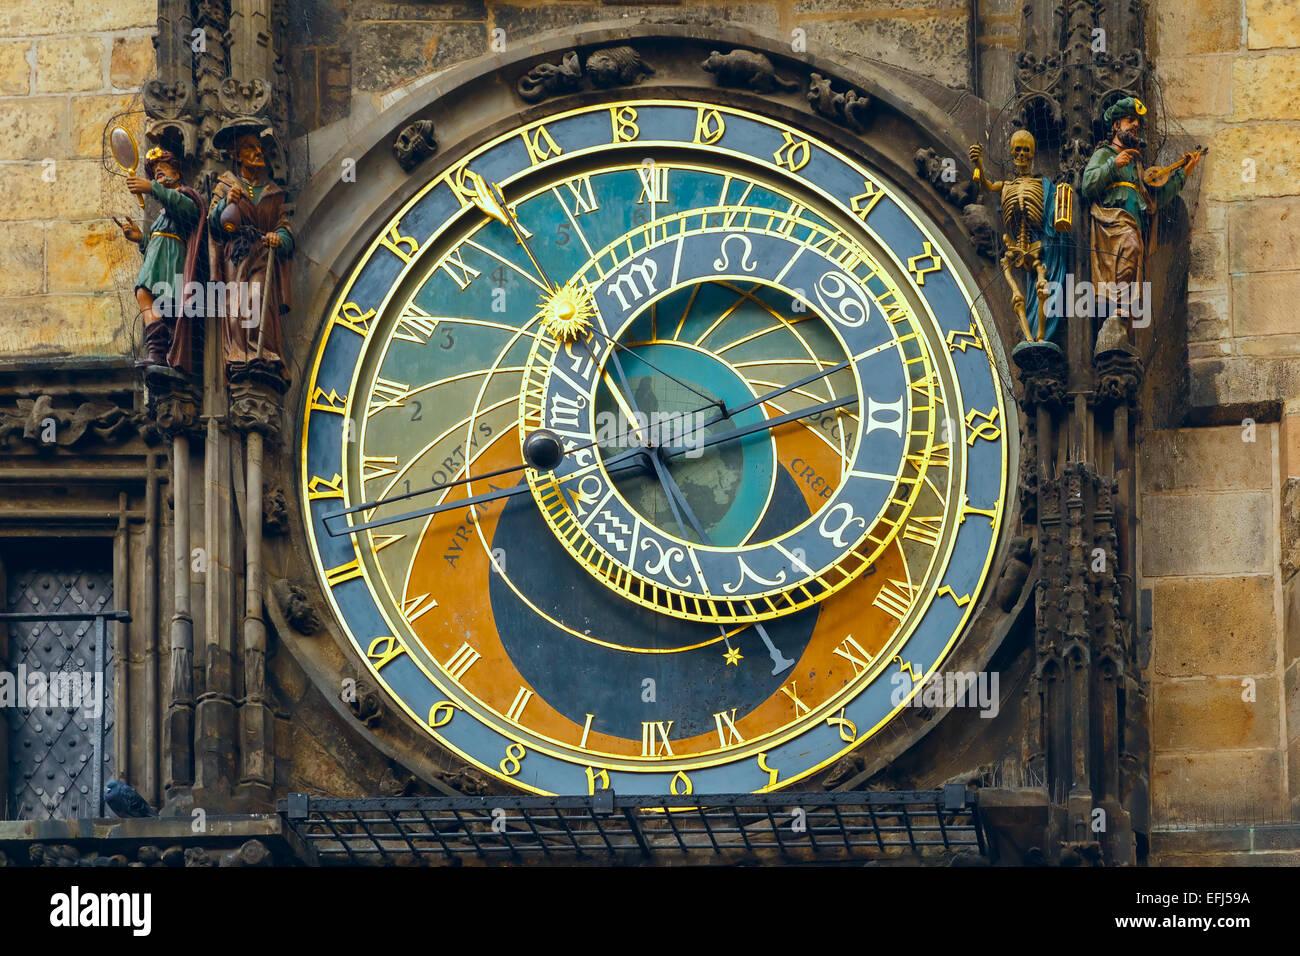 Prague Astronomical Clock (Orloj) in the Old Town Square, Czech republic - Stock Image